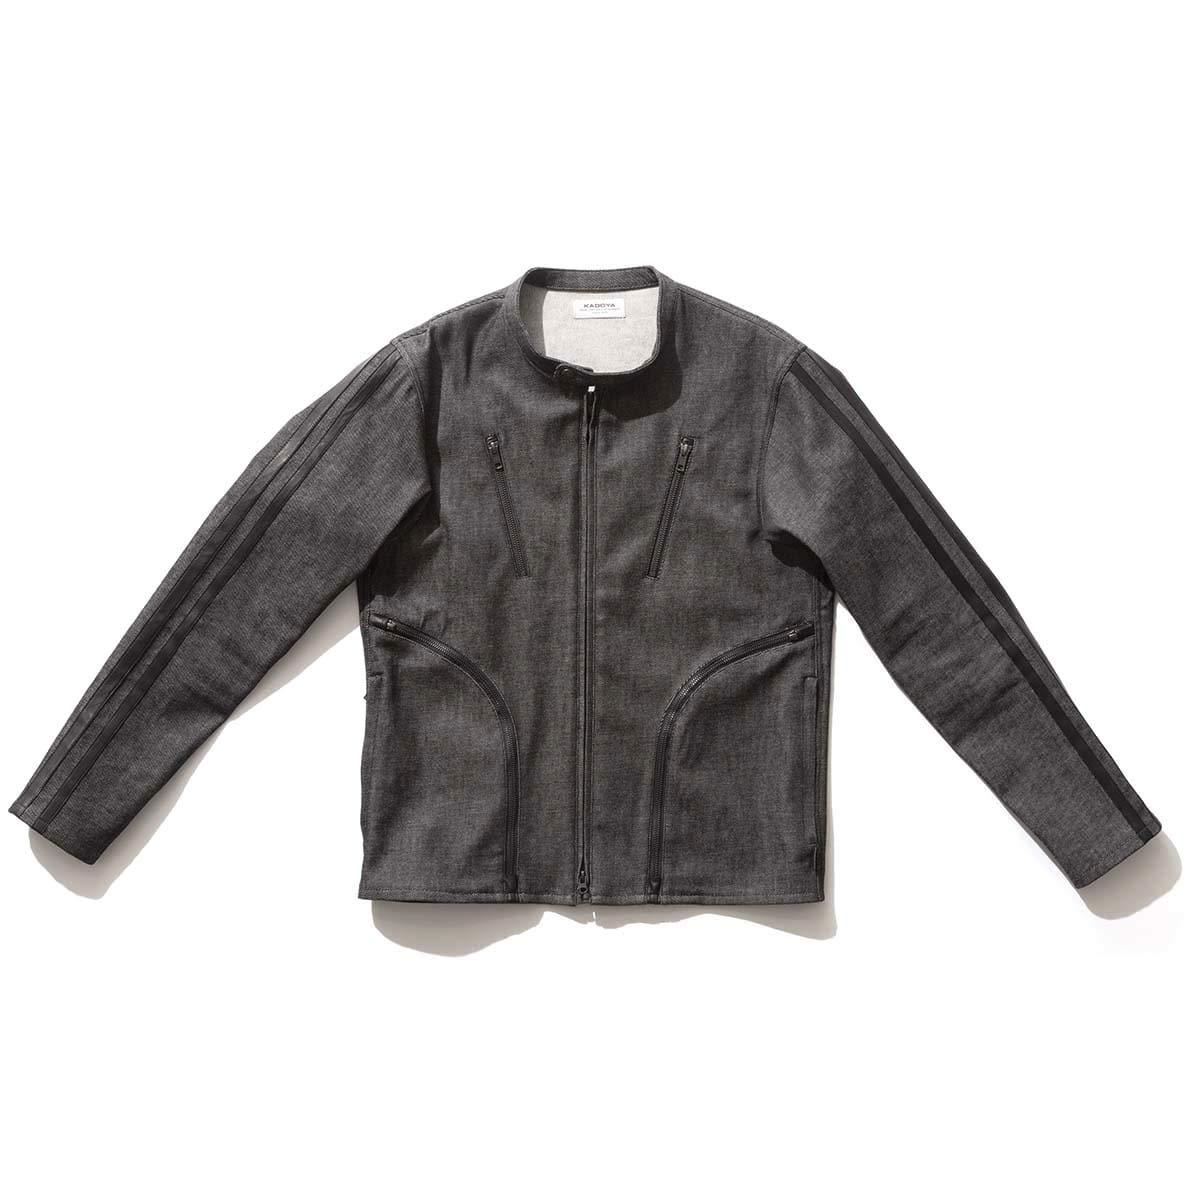 CORSA XS カドヤ(KADOYA) BK JACKET 品番:6245-0/BK/XS【smtb-s】